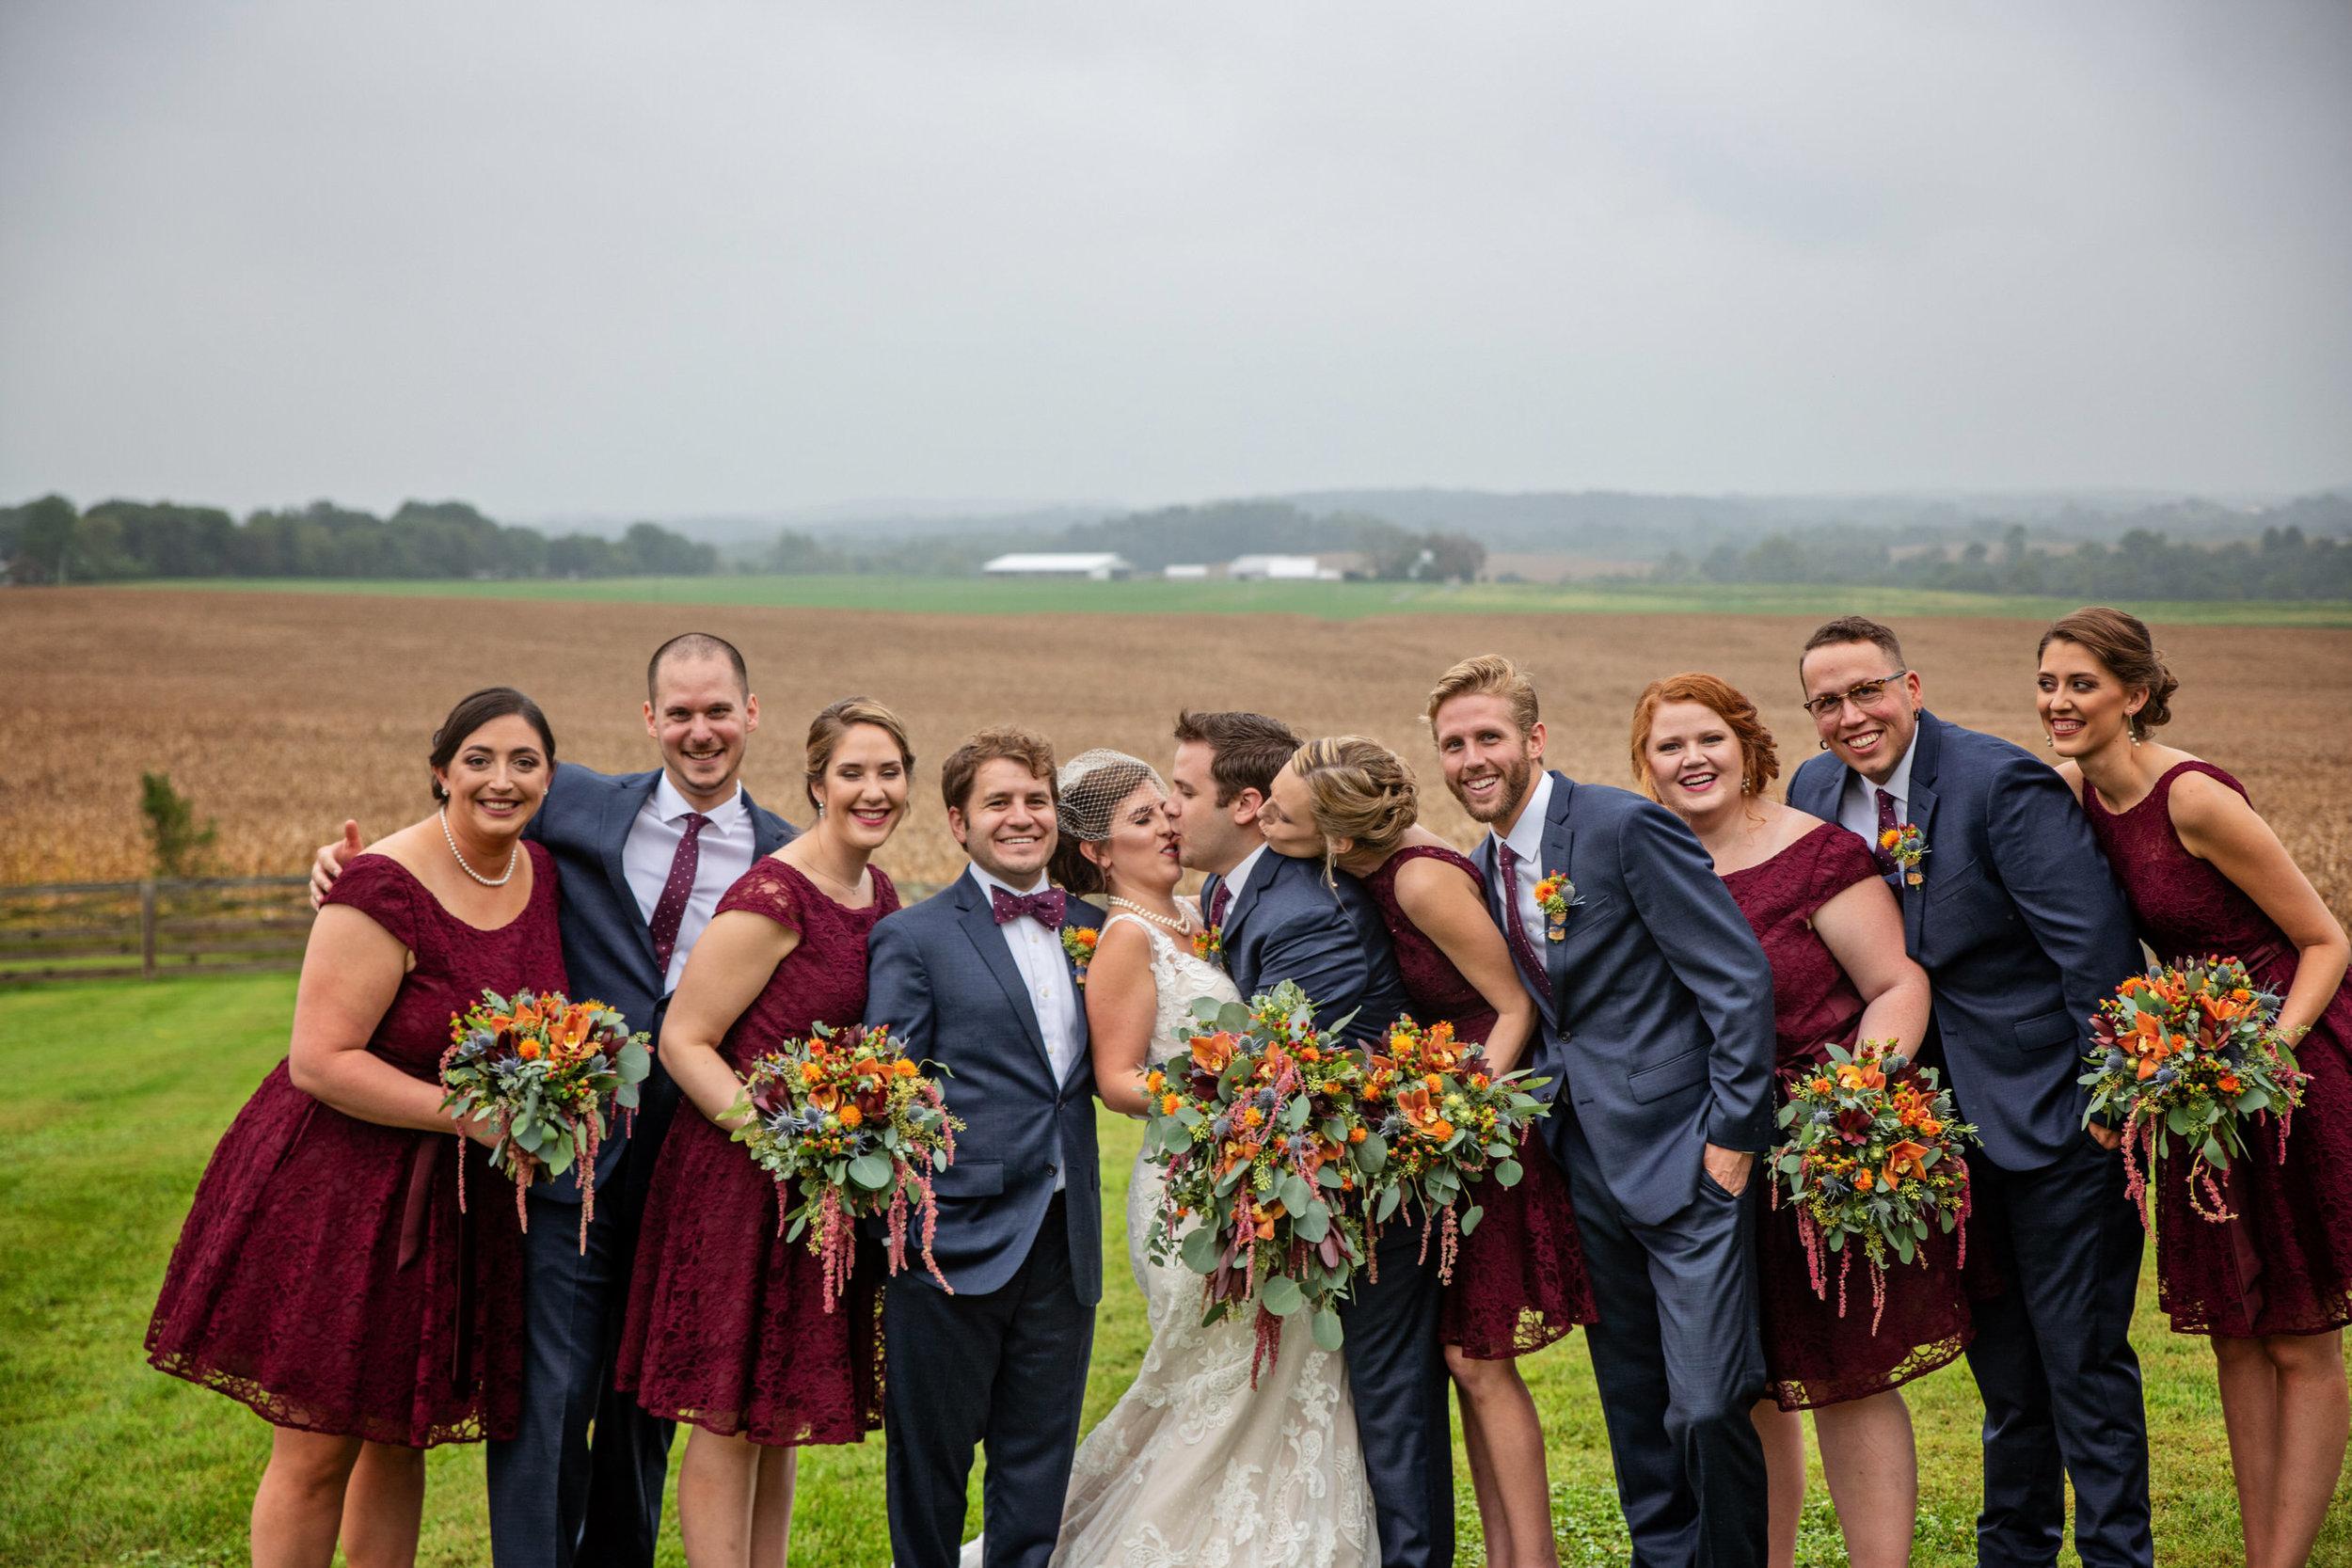 WalkersOverlookWedding-Angela&Ben-WeddingParty-2.jpg